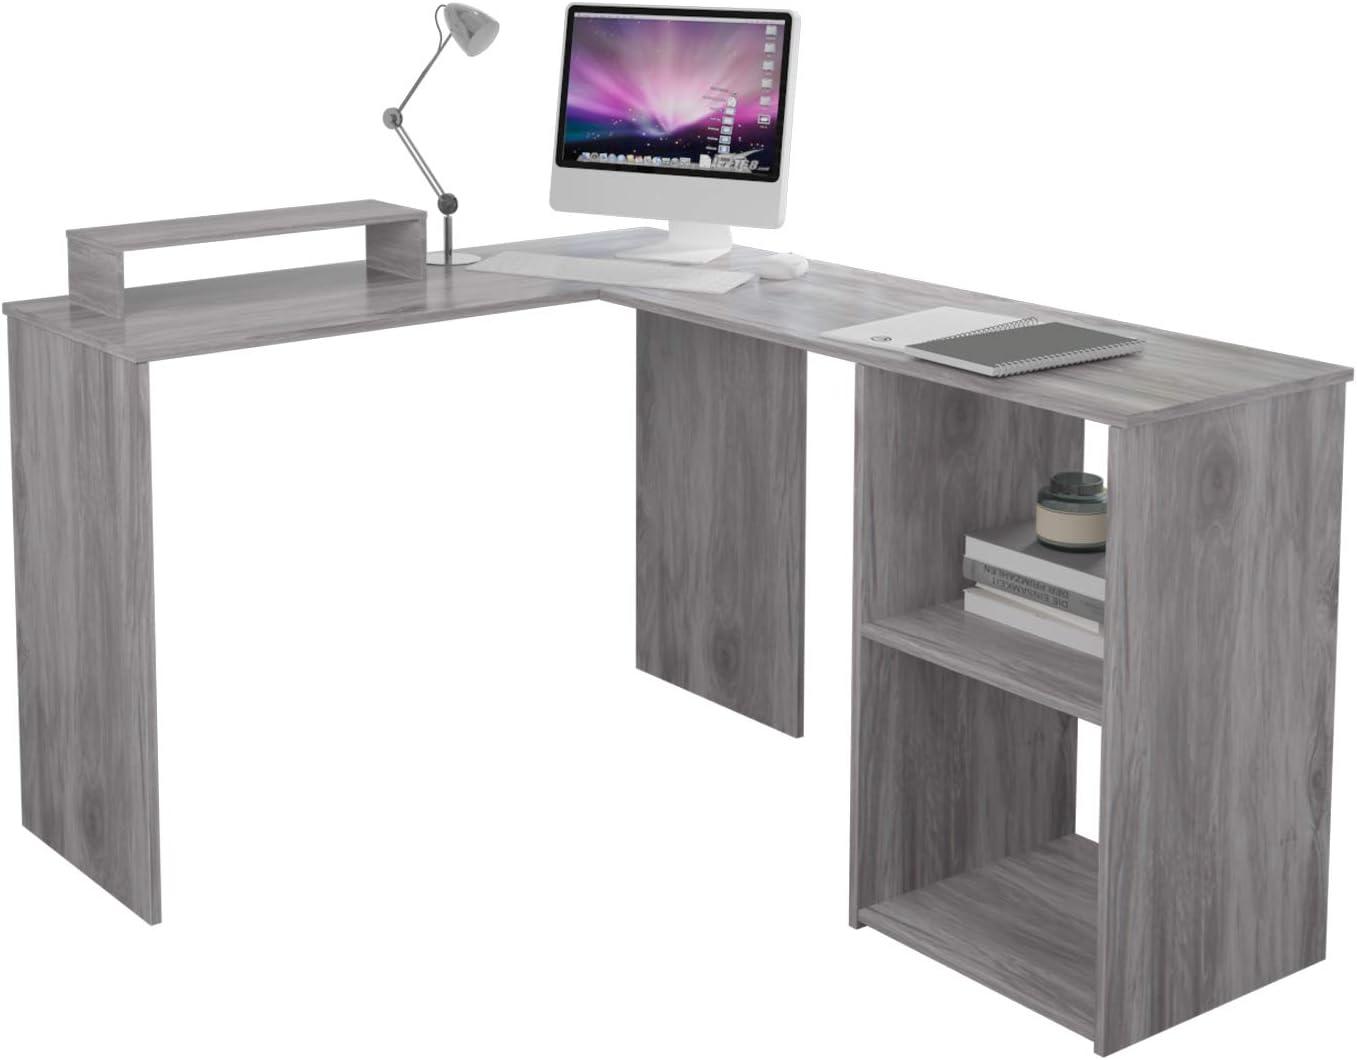 EUCO Escritorio para ordenador, gris de oficina en forma de L, estación de trabajo de madera, escritorio grande para juegos, mesa de estudio para hogar/oficina, 135 x 112 cm